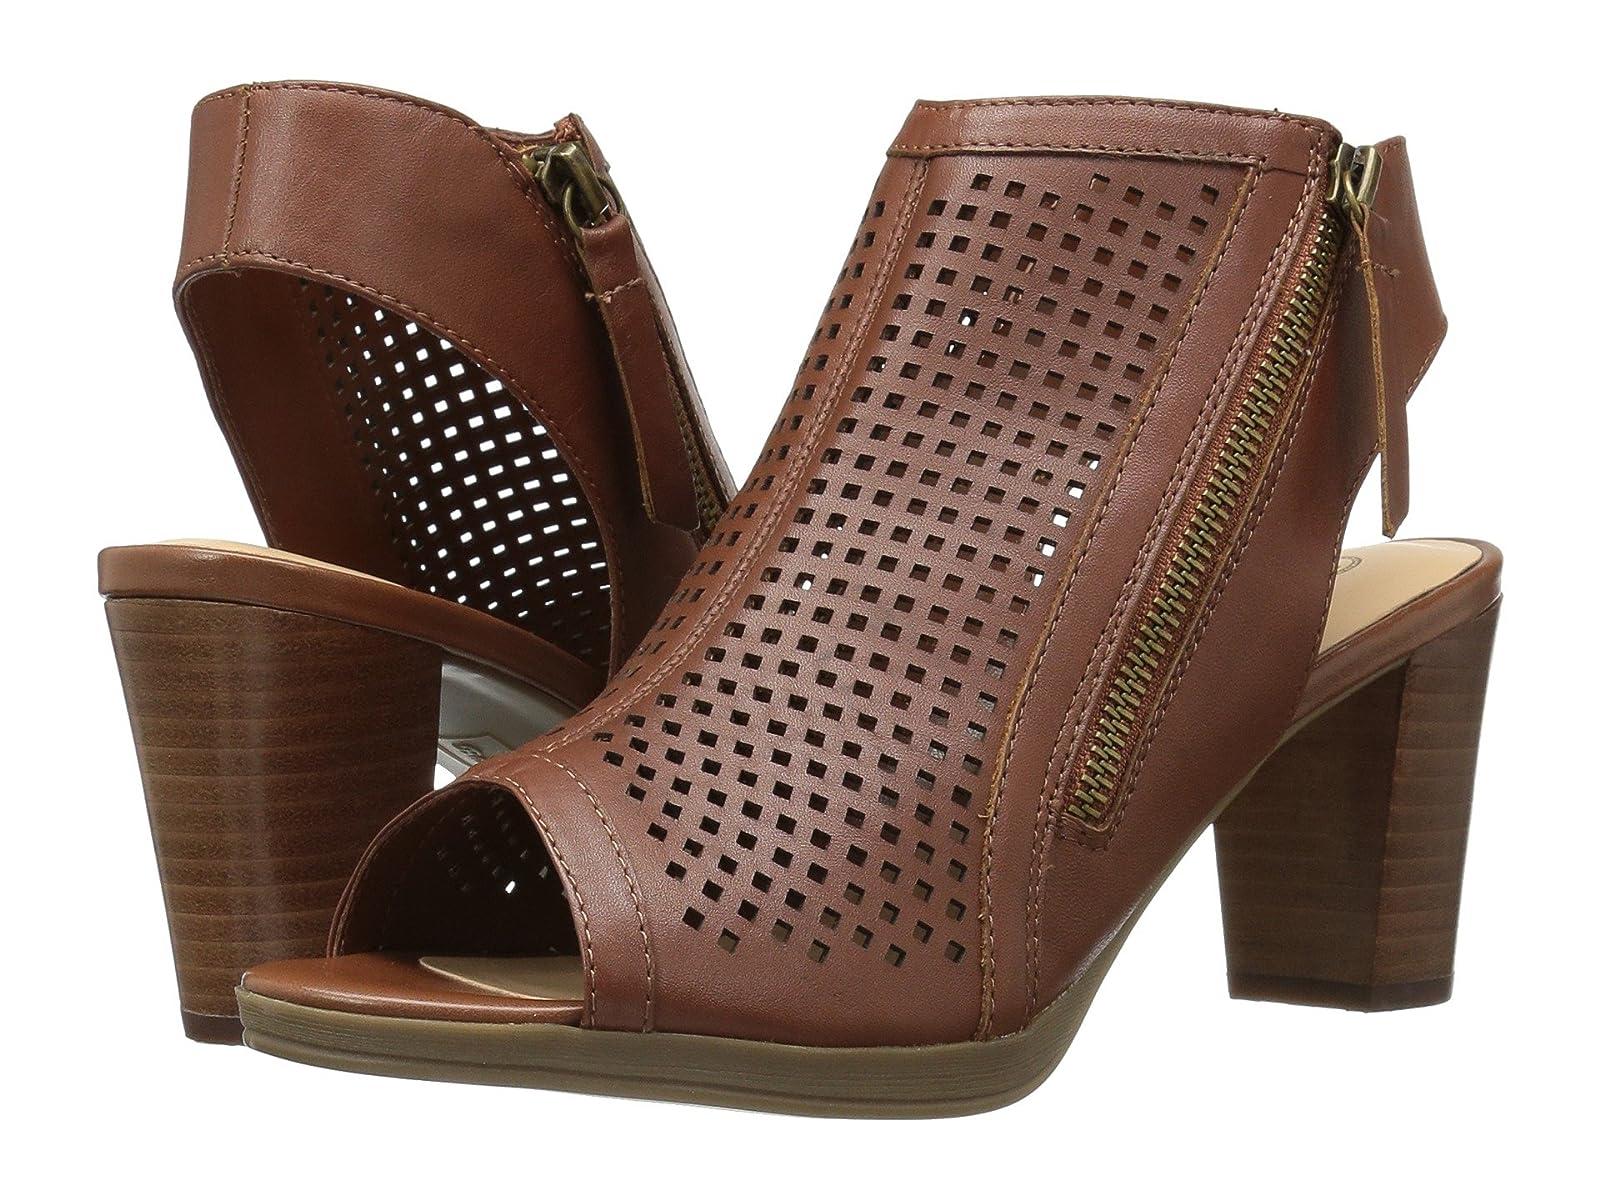 Bella-Vita LenoreCheap and distinctive eye-catching shoes